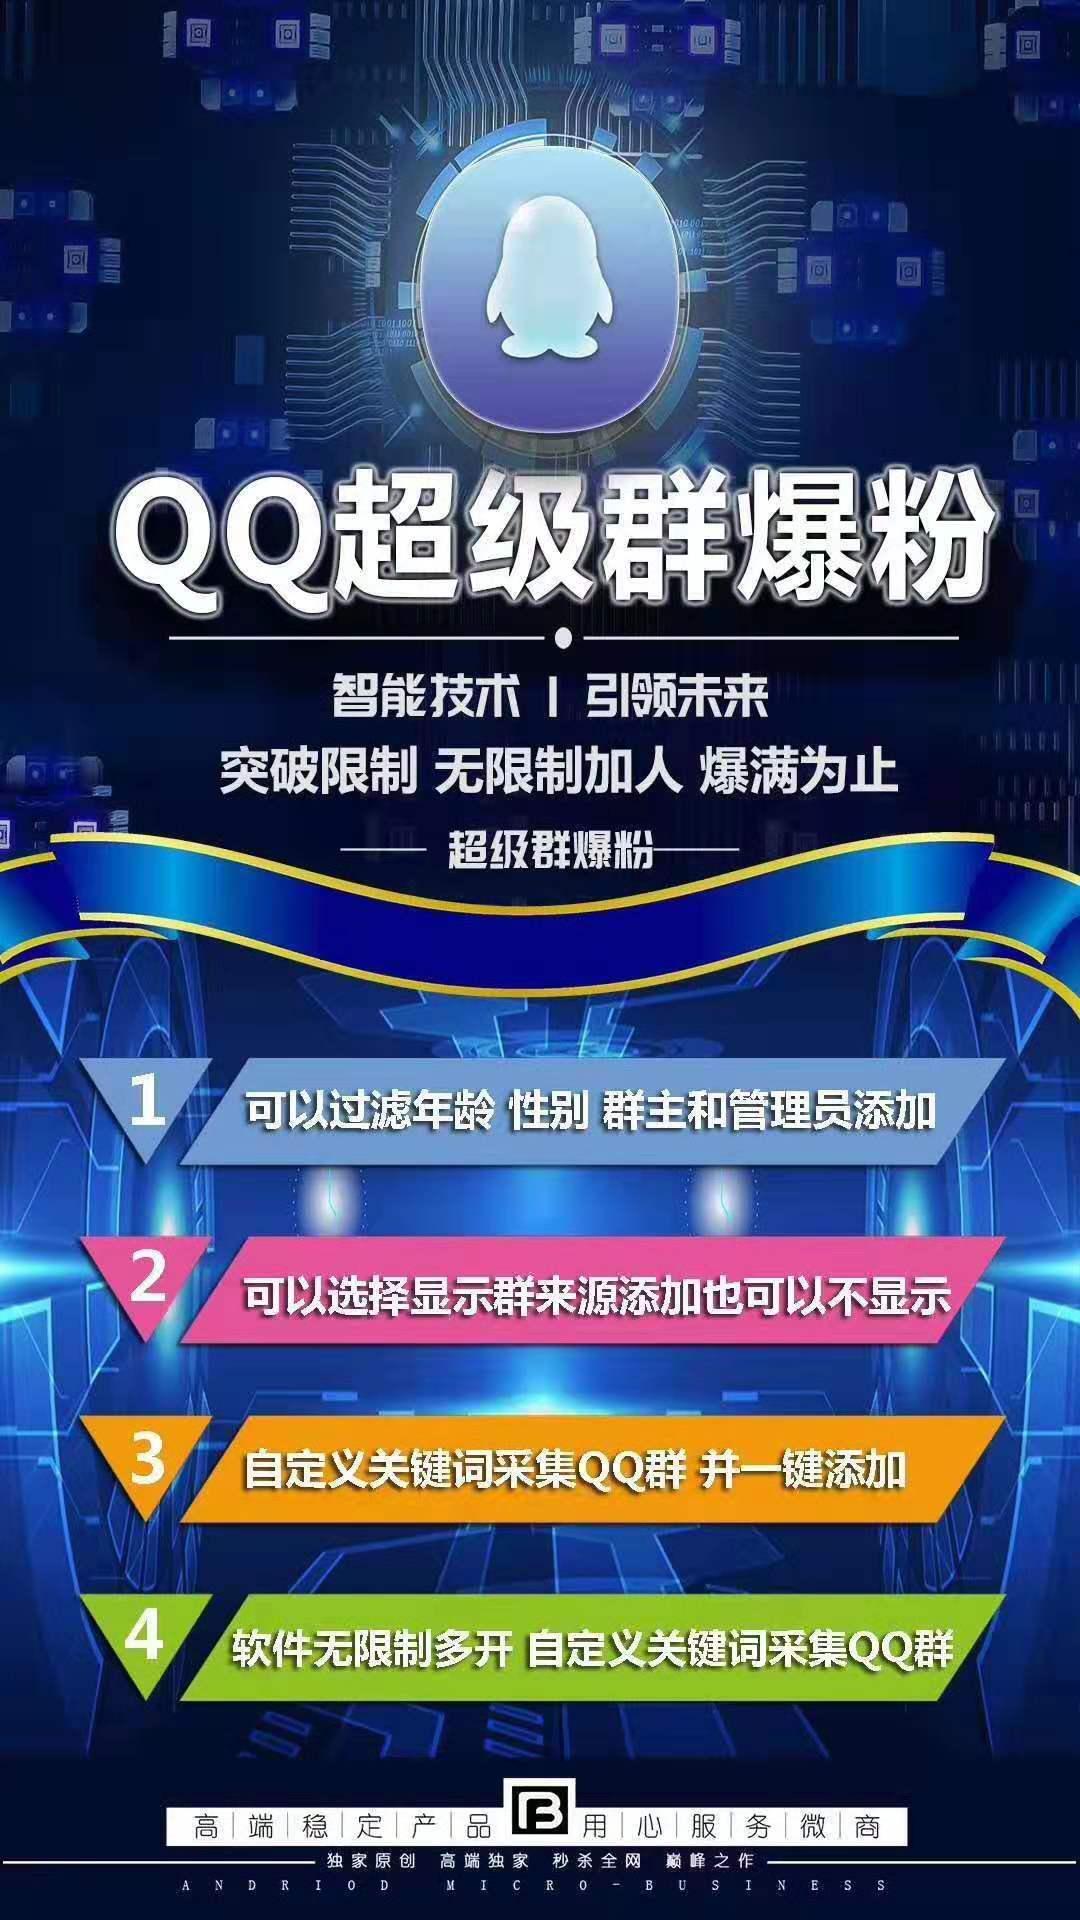 【QQ超级群爆粉】年卡QQ爆粉神器每日爆500人  过滤年龄性别群主和管理员添加 自定义采集QQ群一键添加